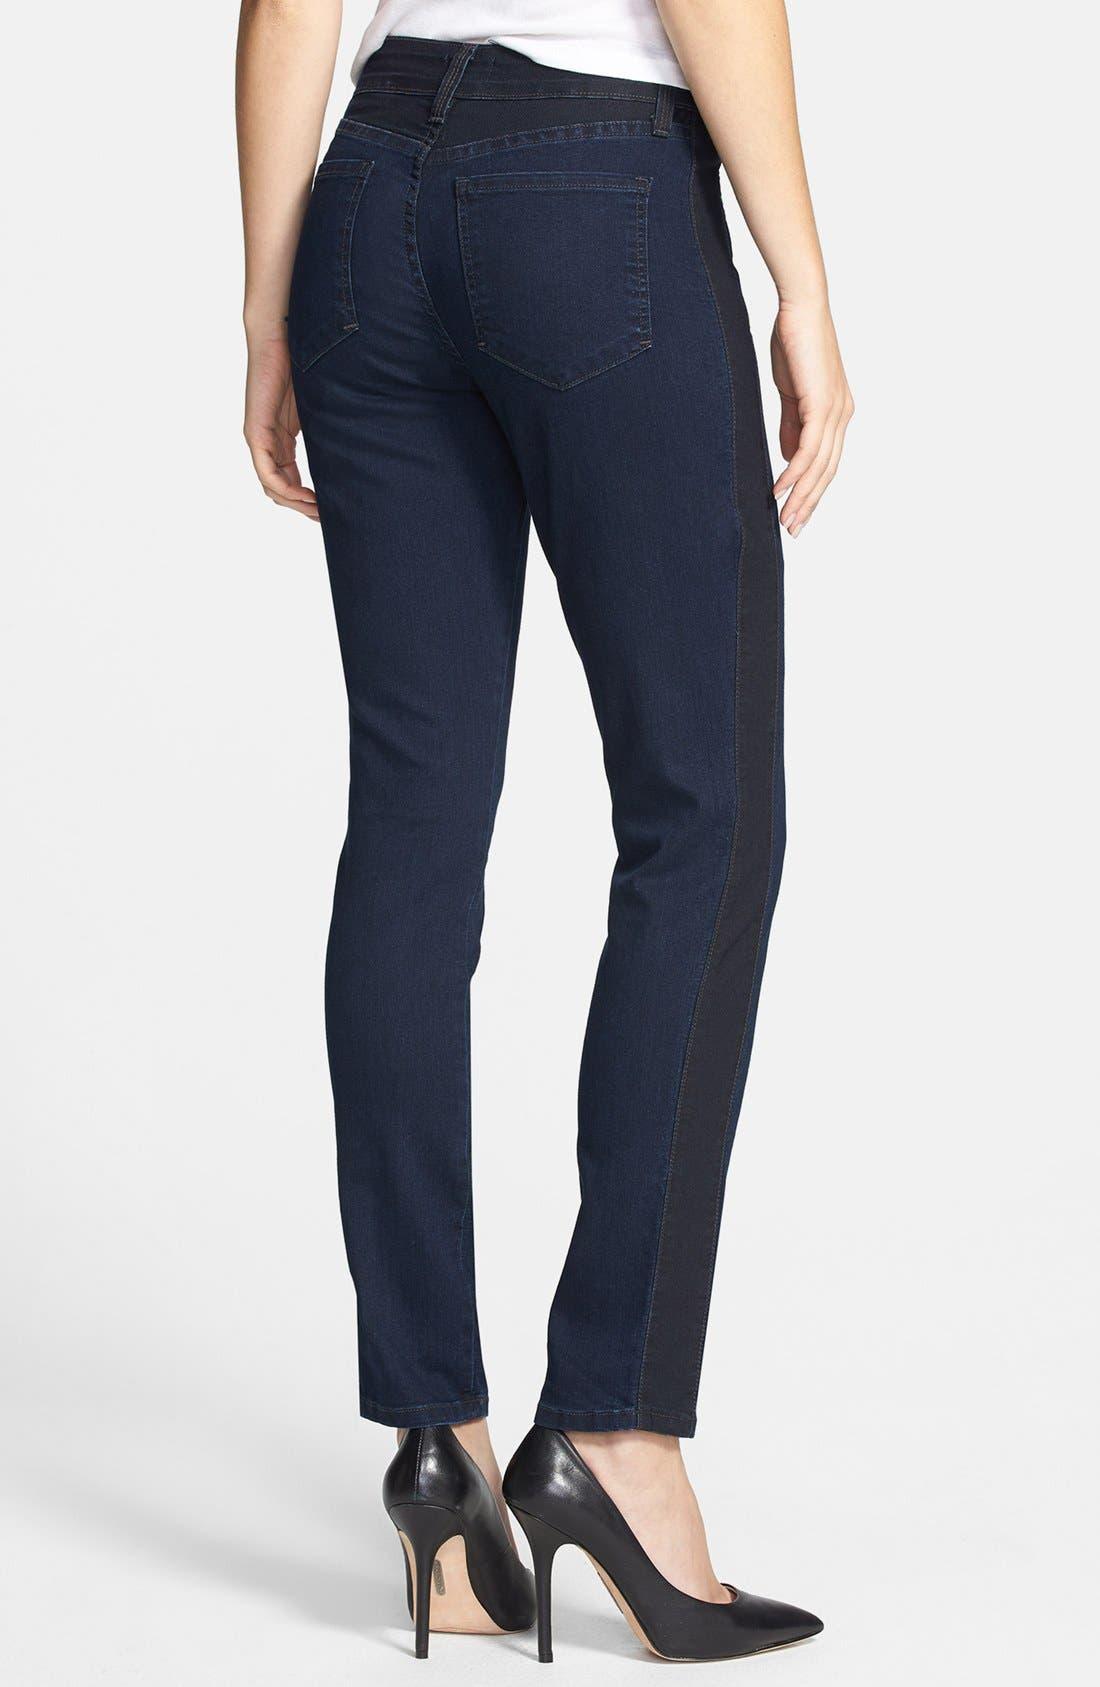 Alternate Image 2  - NYDJ 'Alexandra' Tuxedo Stripe Stretch Skinny Jeans (Covina)